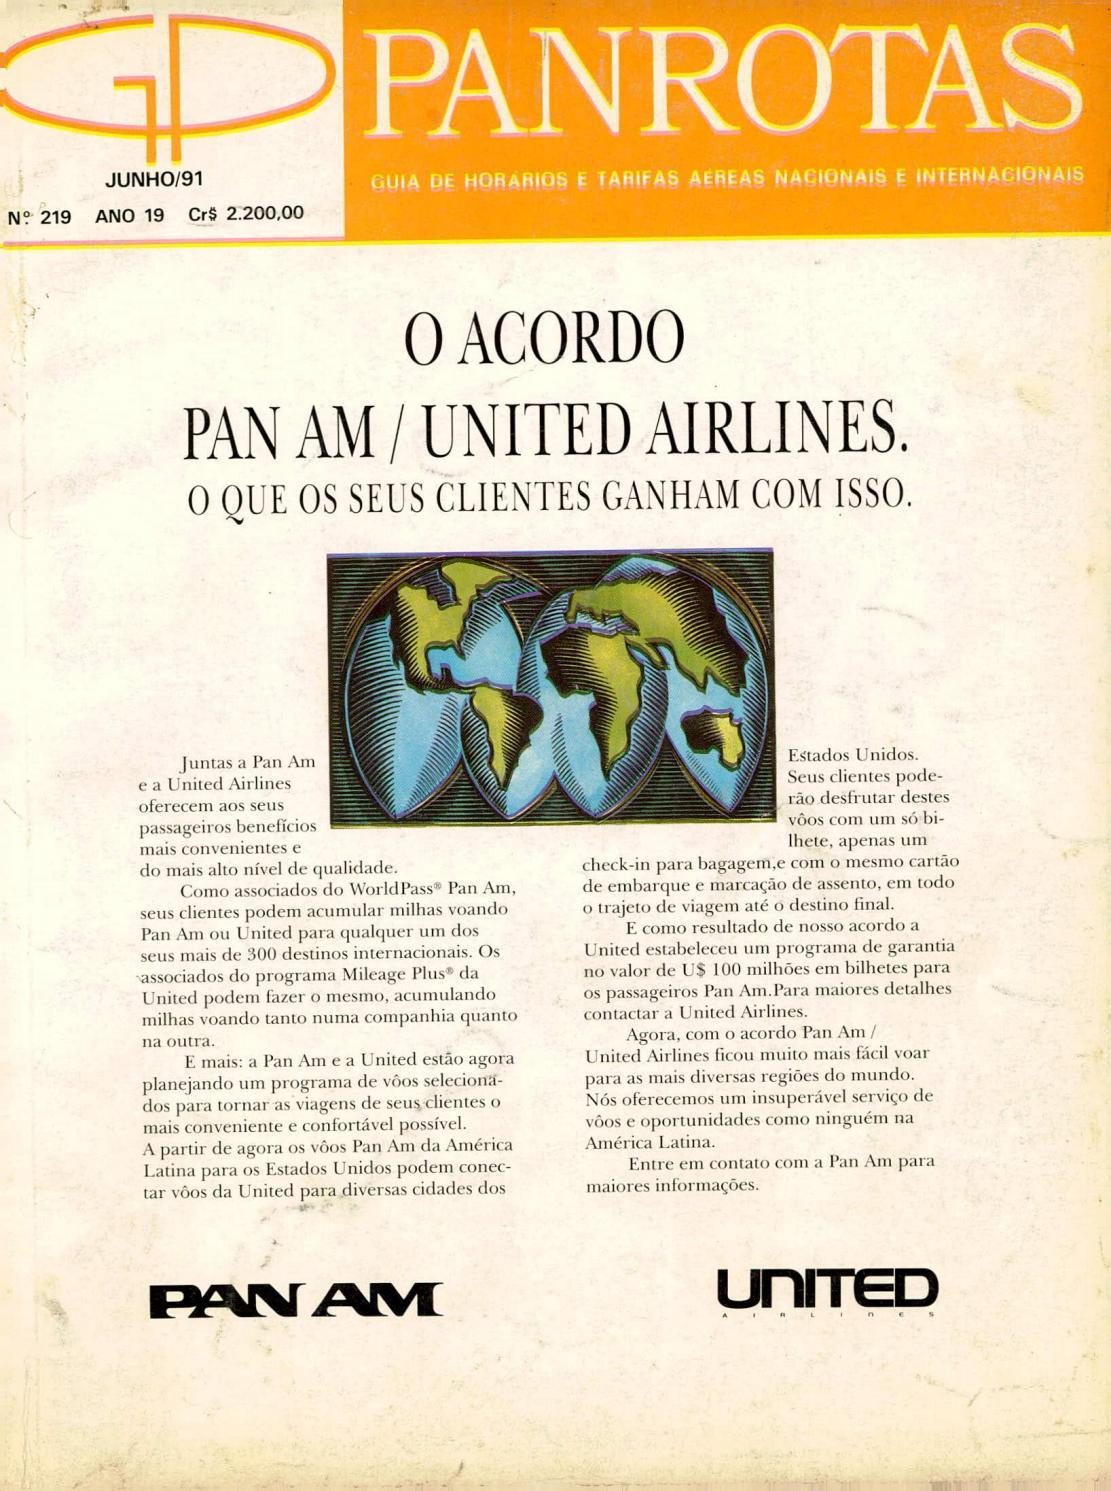 Guia panrotas edio 219 junho1991 by panrotas editora issuu fandeluxe Image collections